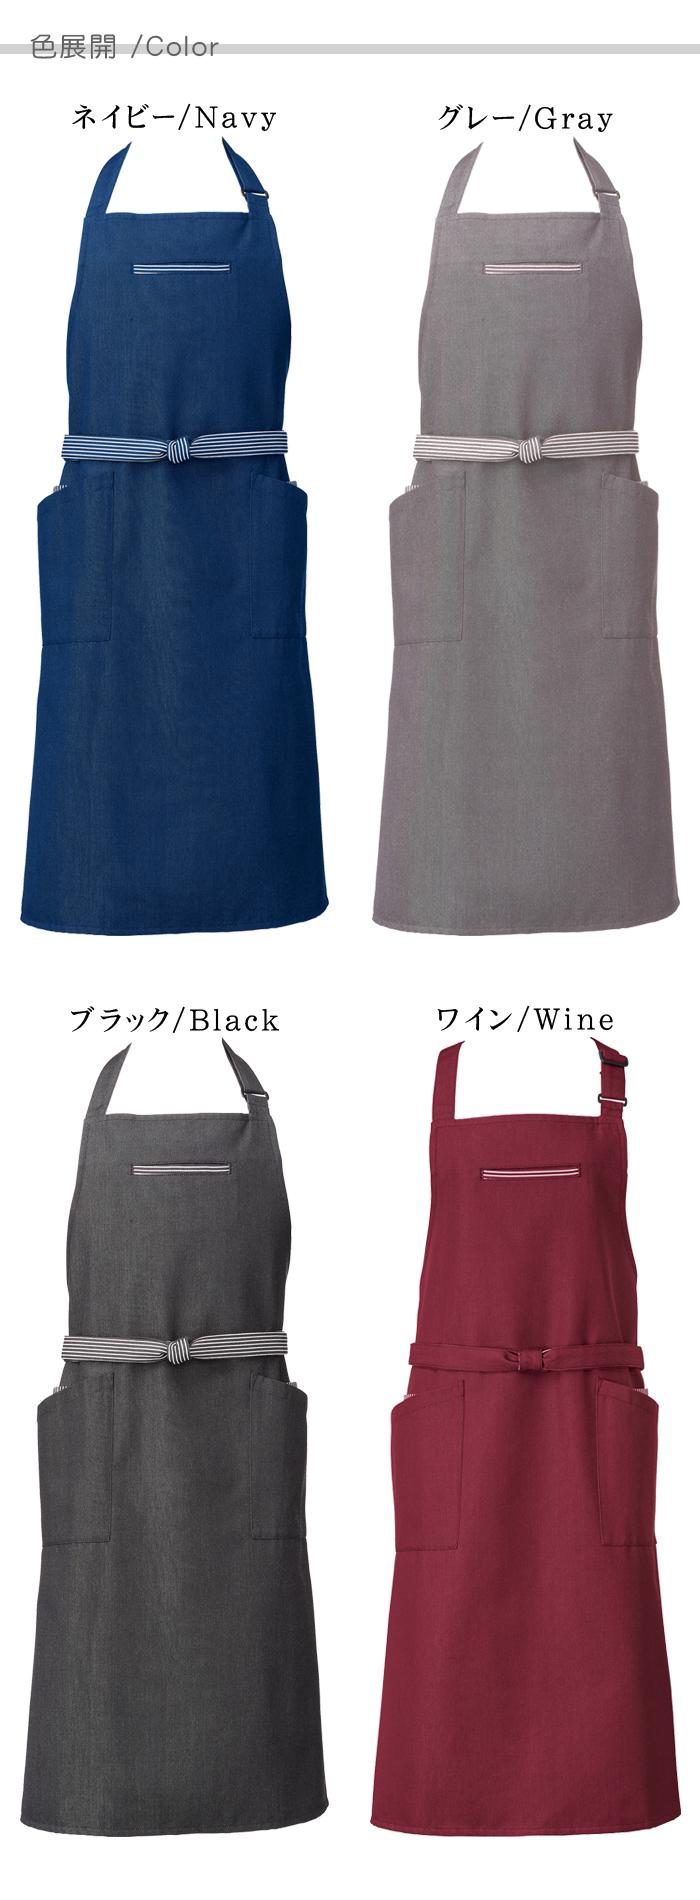 T8324ストライプ柄がヒモやポケットに 胸当て首かけエプロン[カフェ飲食店業務用制服] 色展開説明